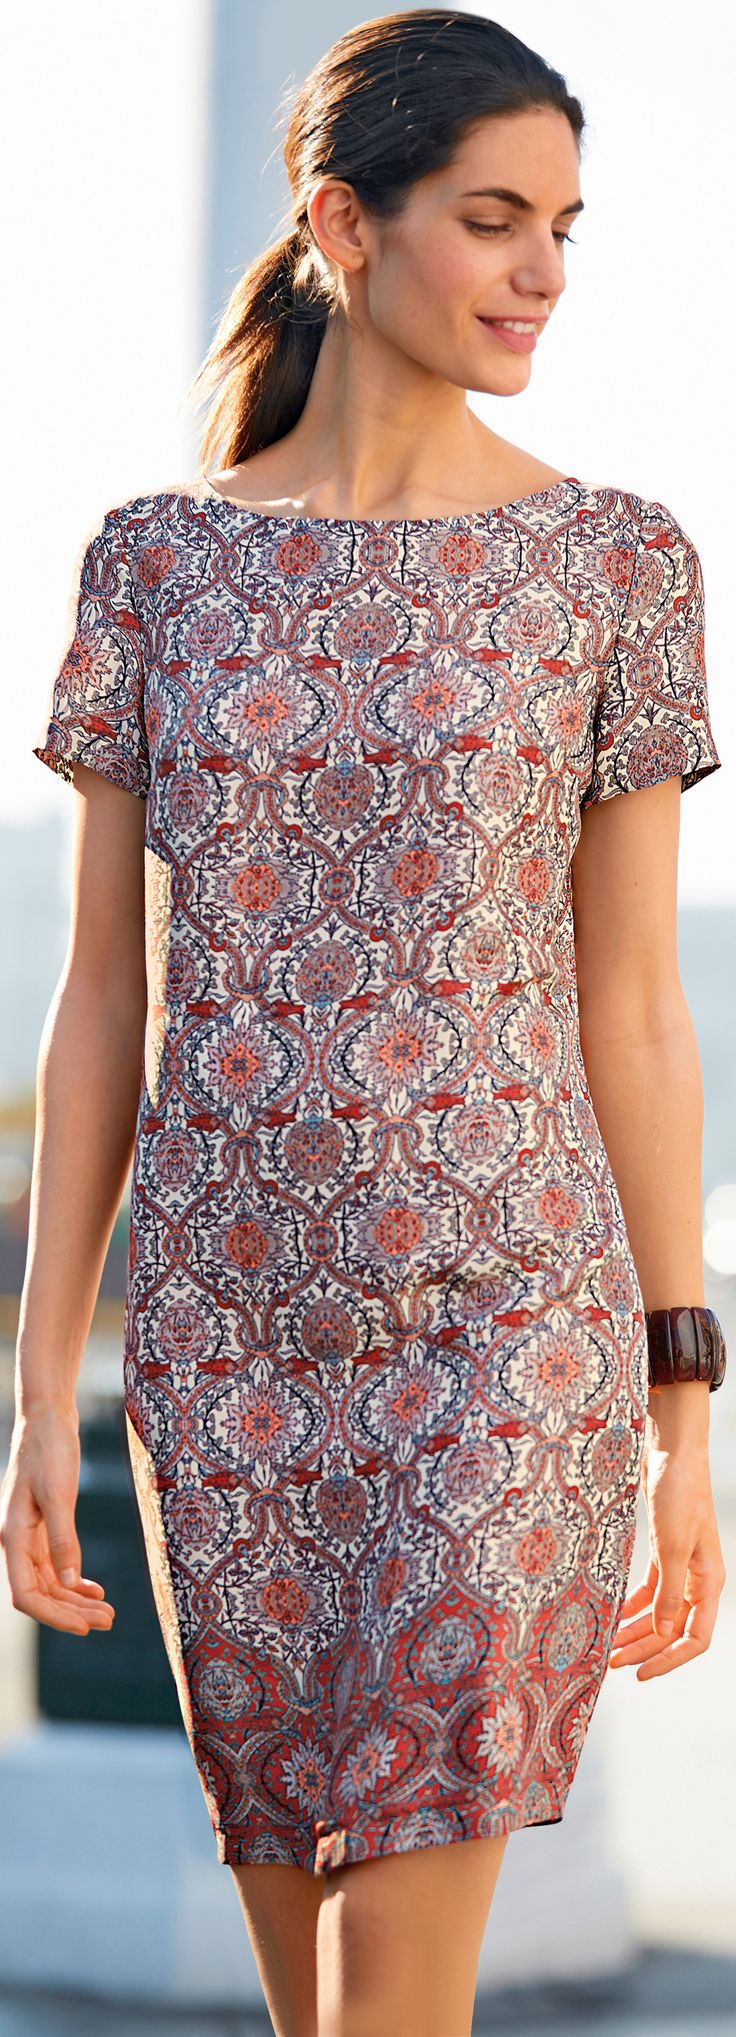 1000 images about marrekesh on pinterest topshop back for Tile fashion